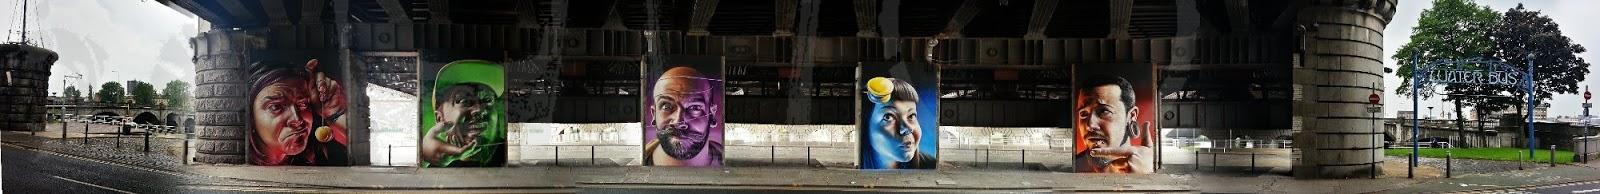 Heads yoyo, Broomielaw, Clyde Viaduct, Glasgow